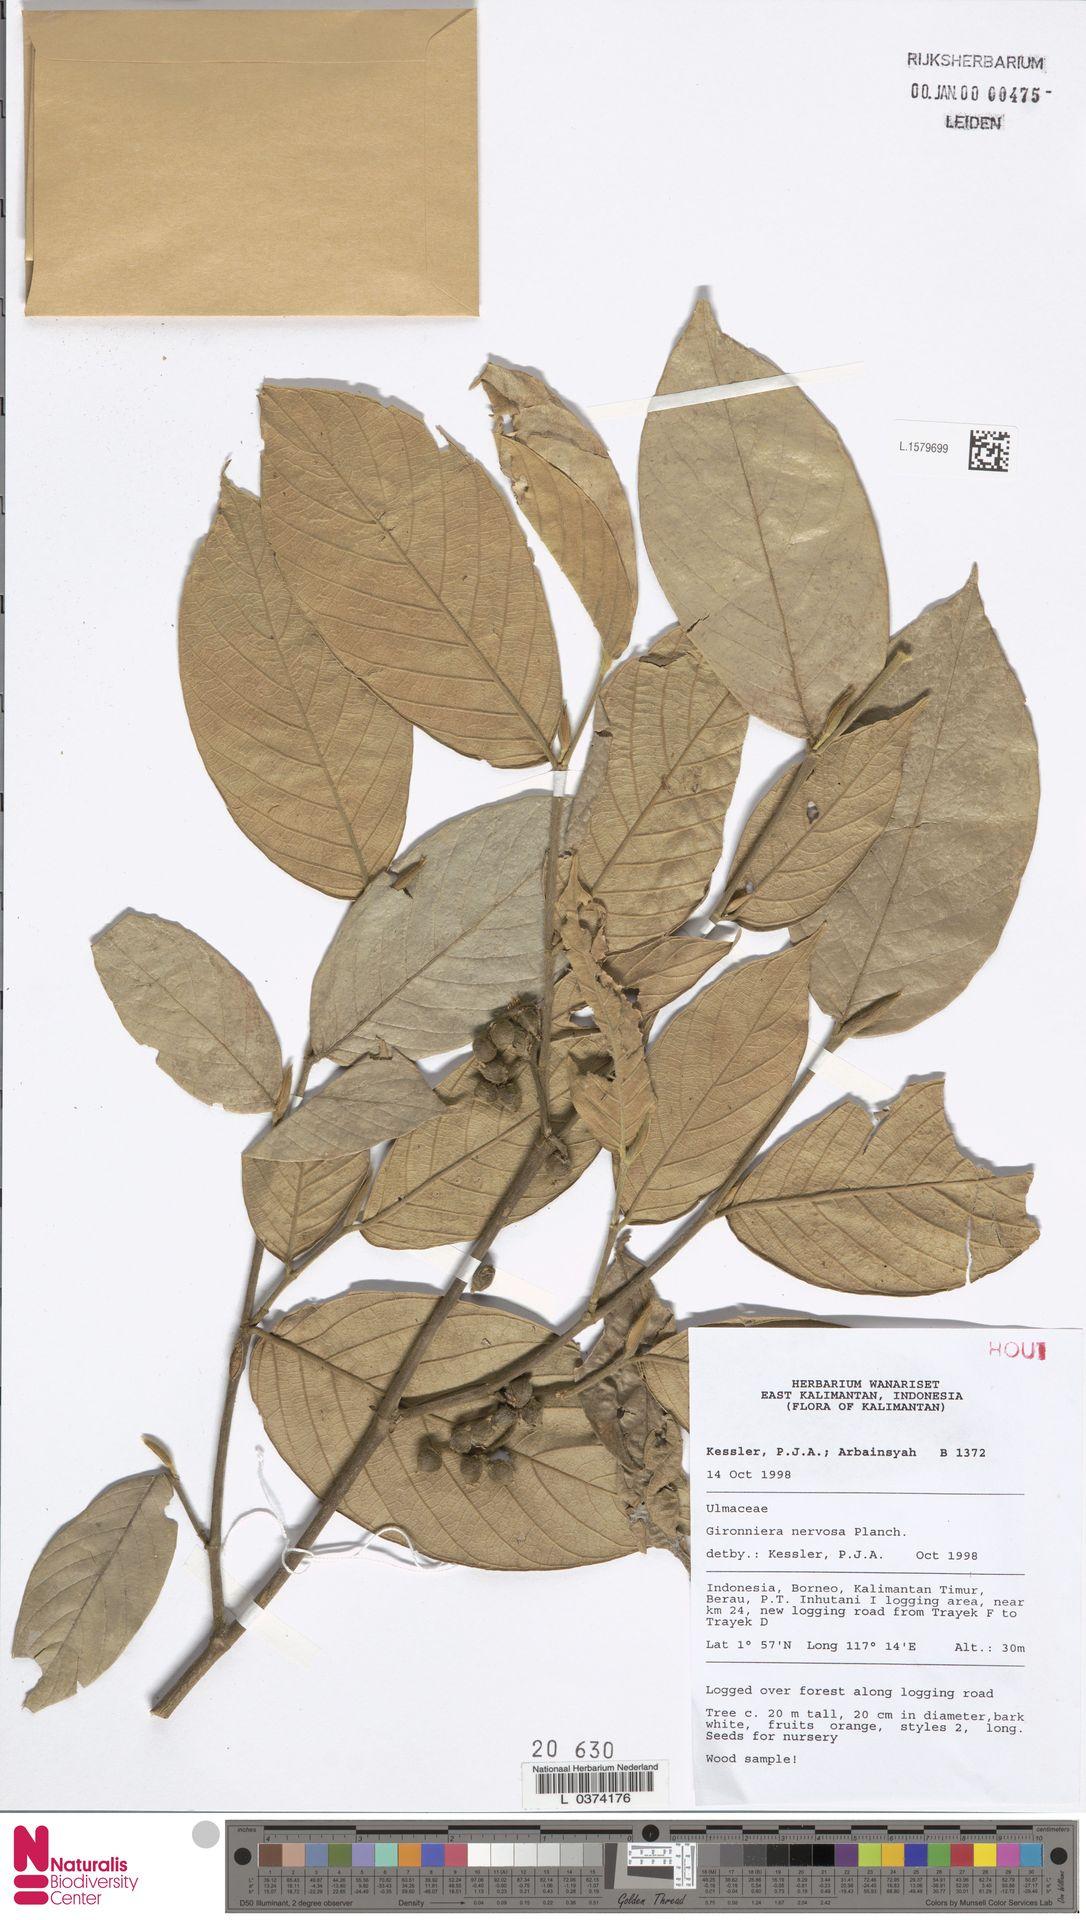 L.1579699 | Gironniera nervosa Planch.